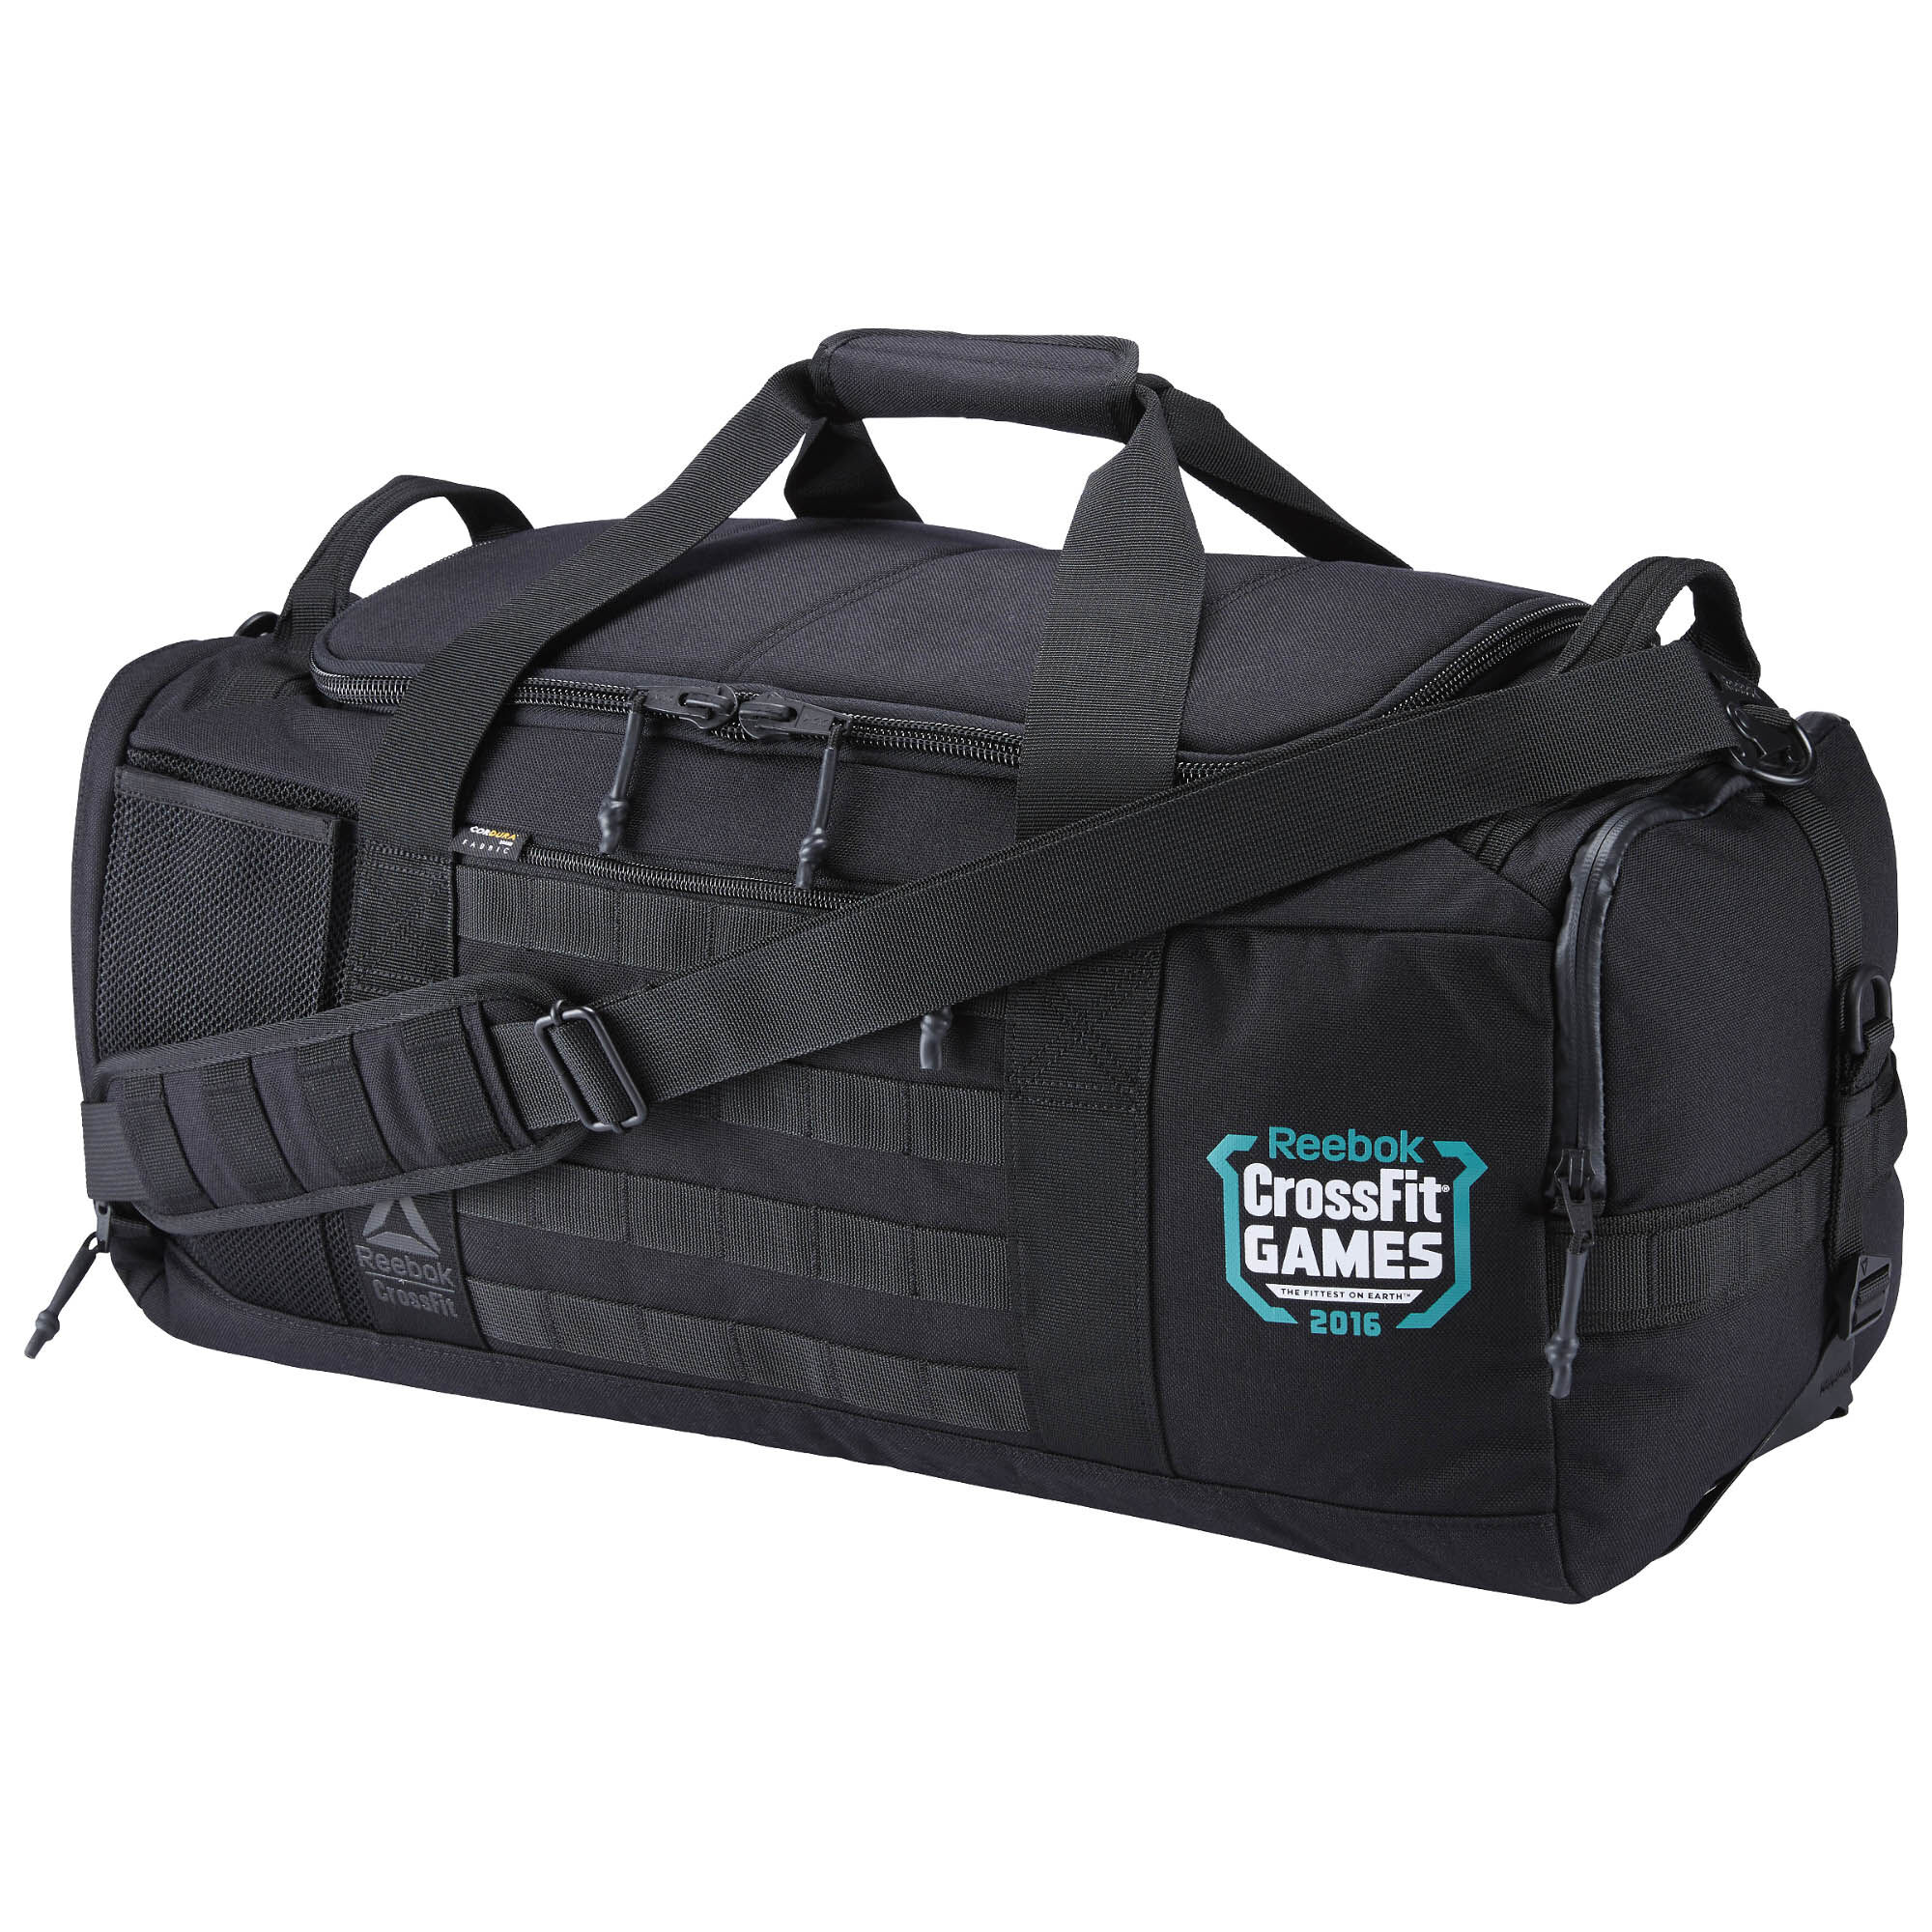 reebok backpack 2015 cheap   OFF61% The Largest Catalog Discounts 7859de164